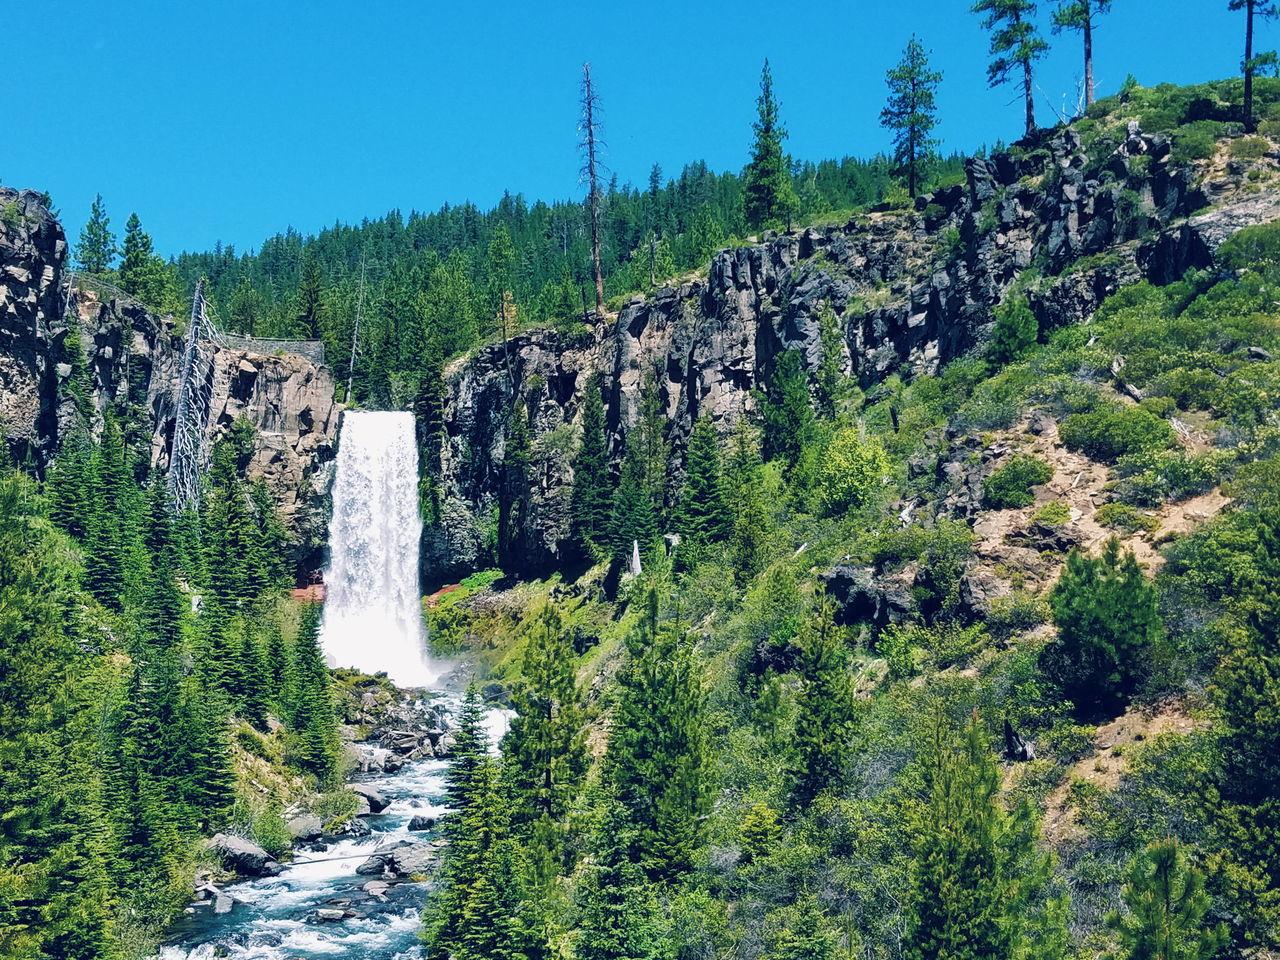 Tumalo Falls Waterfall Oregon Central Oregon Water Trees Blue Sky